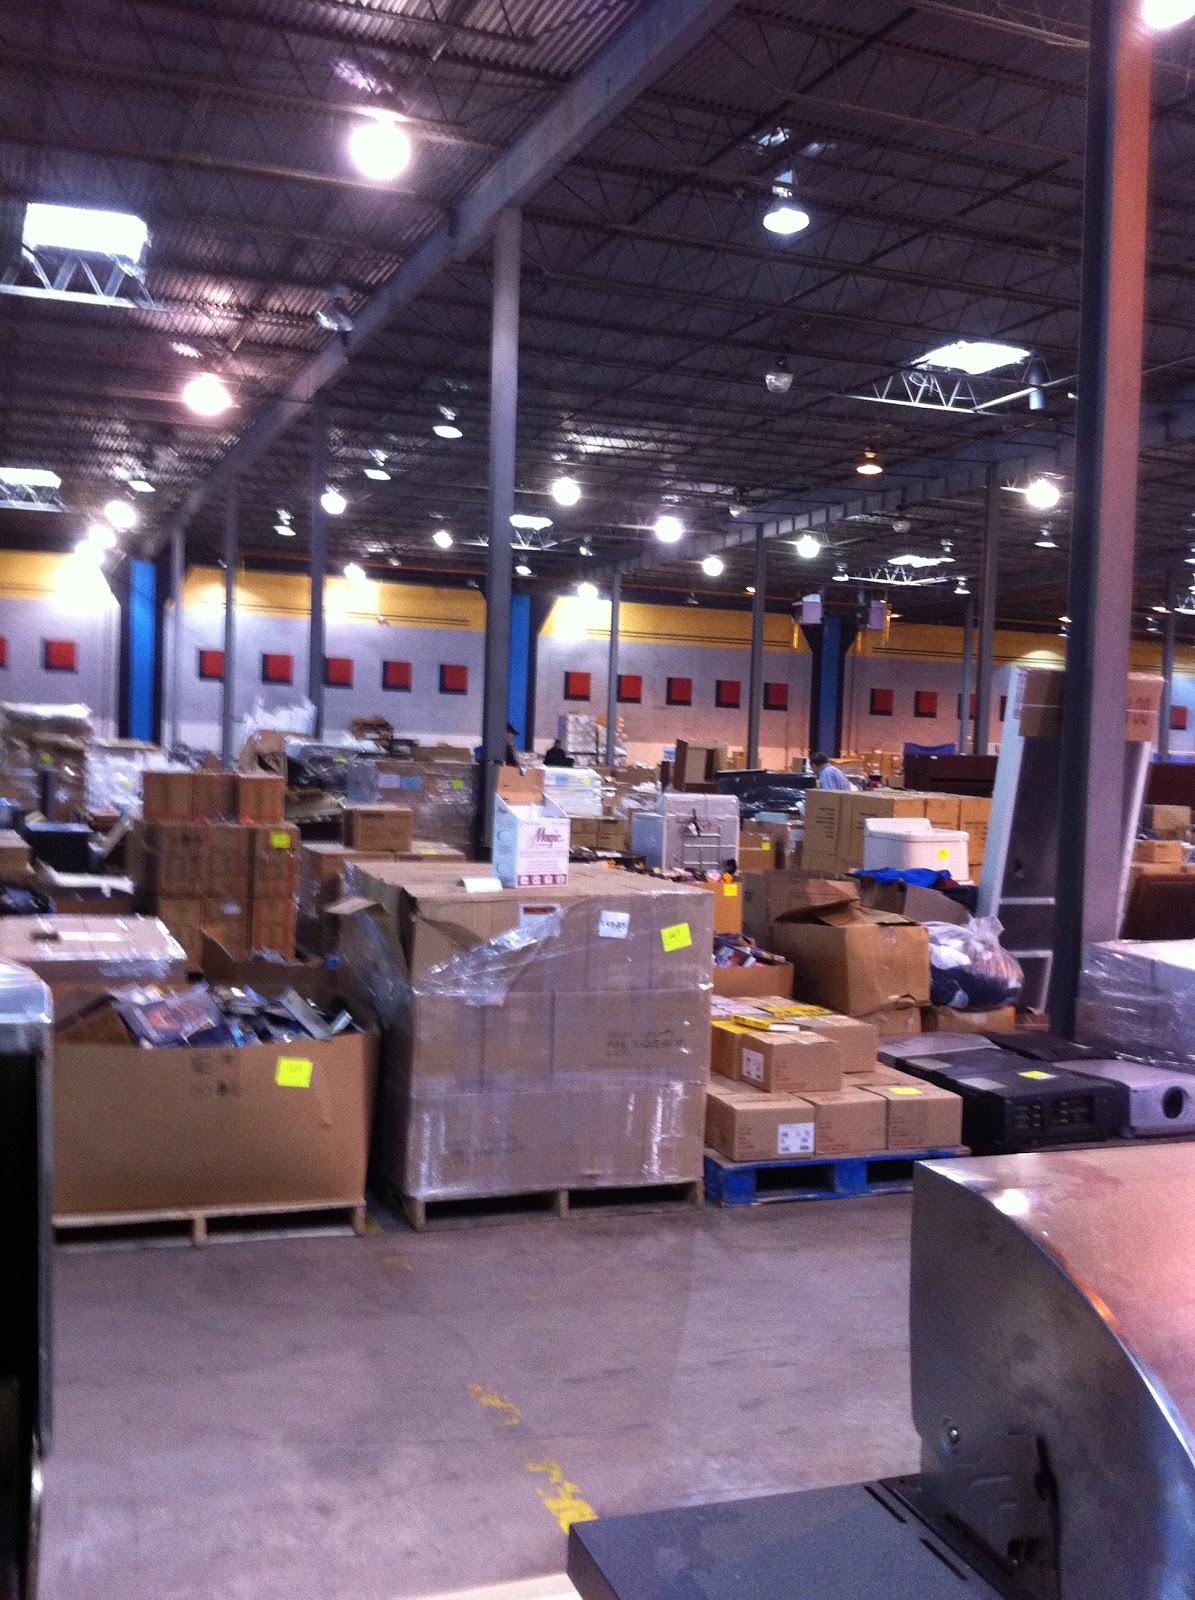 David Jen Max Freight Auction